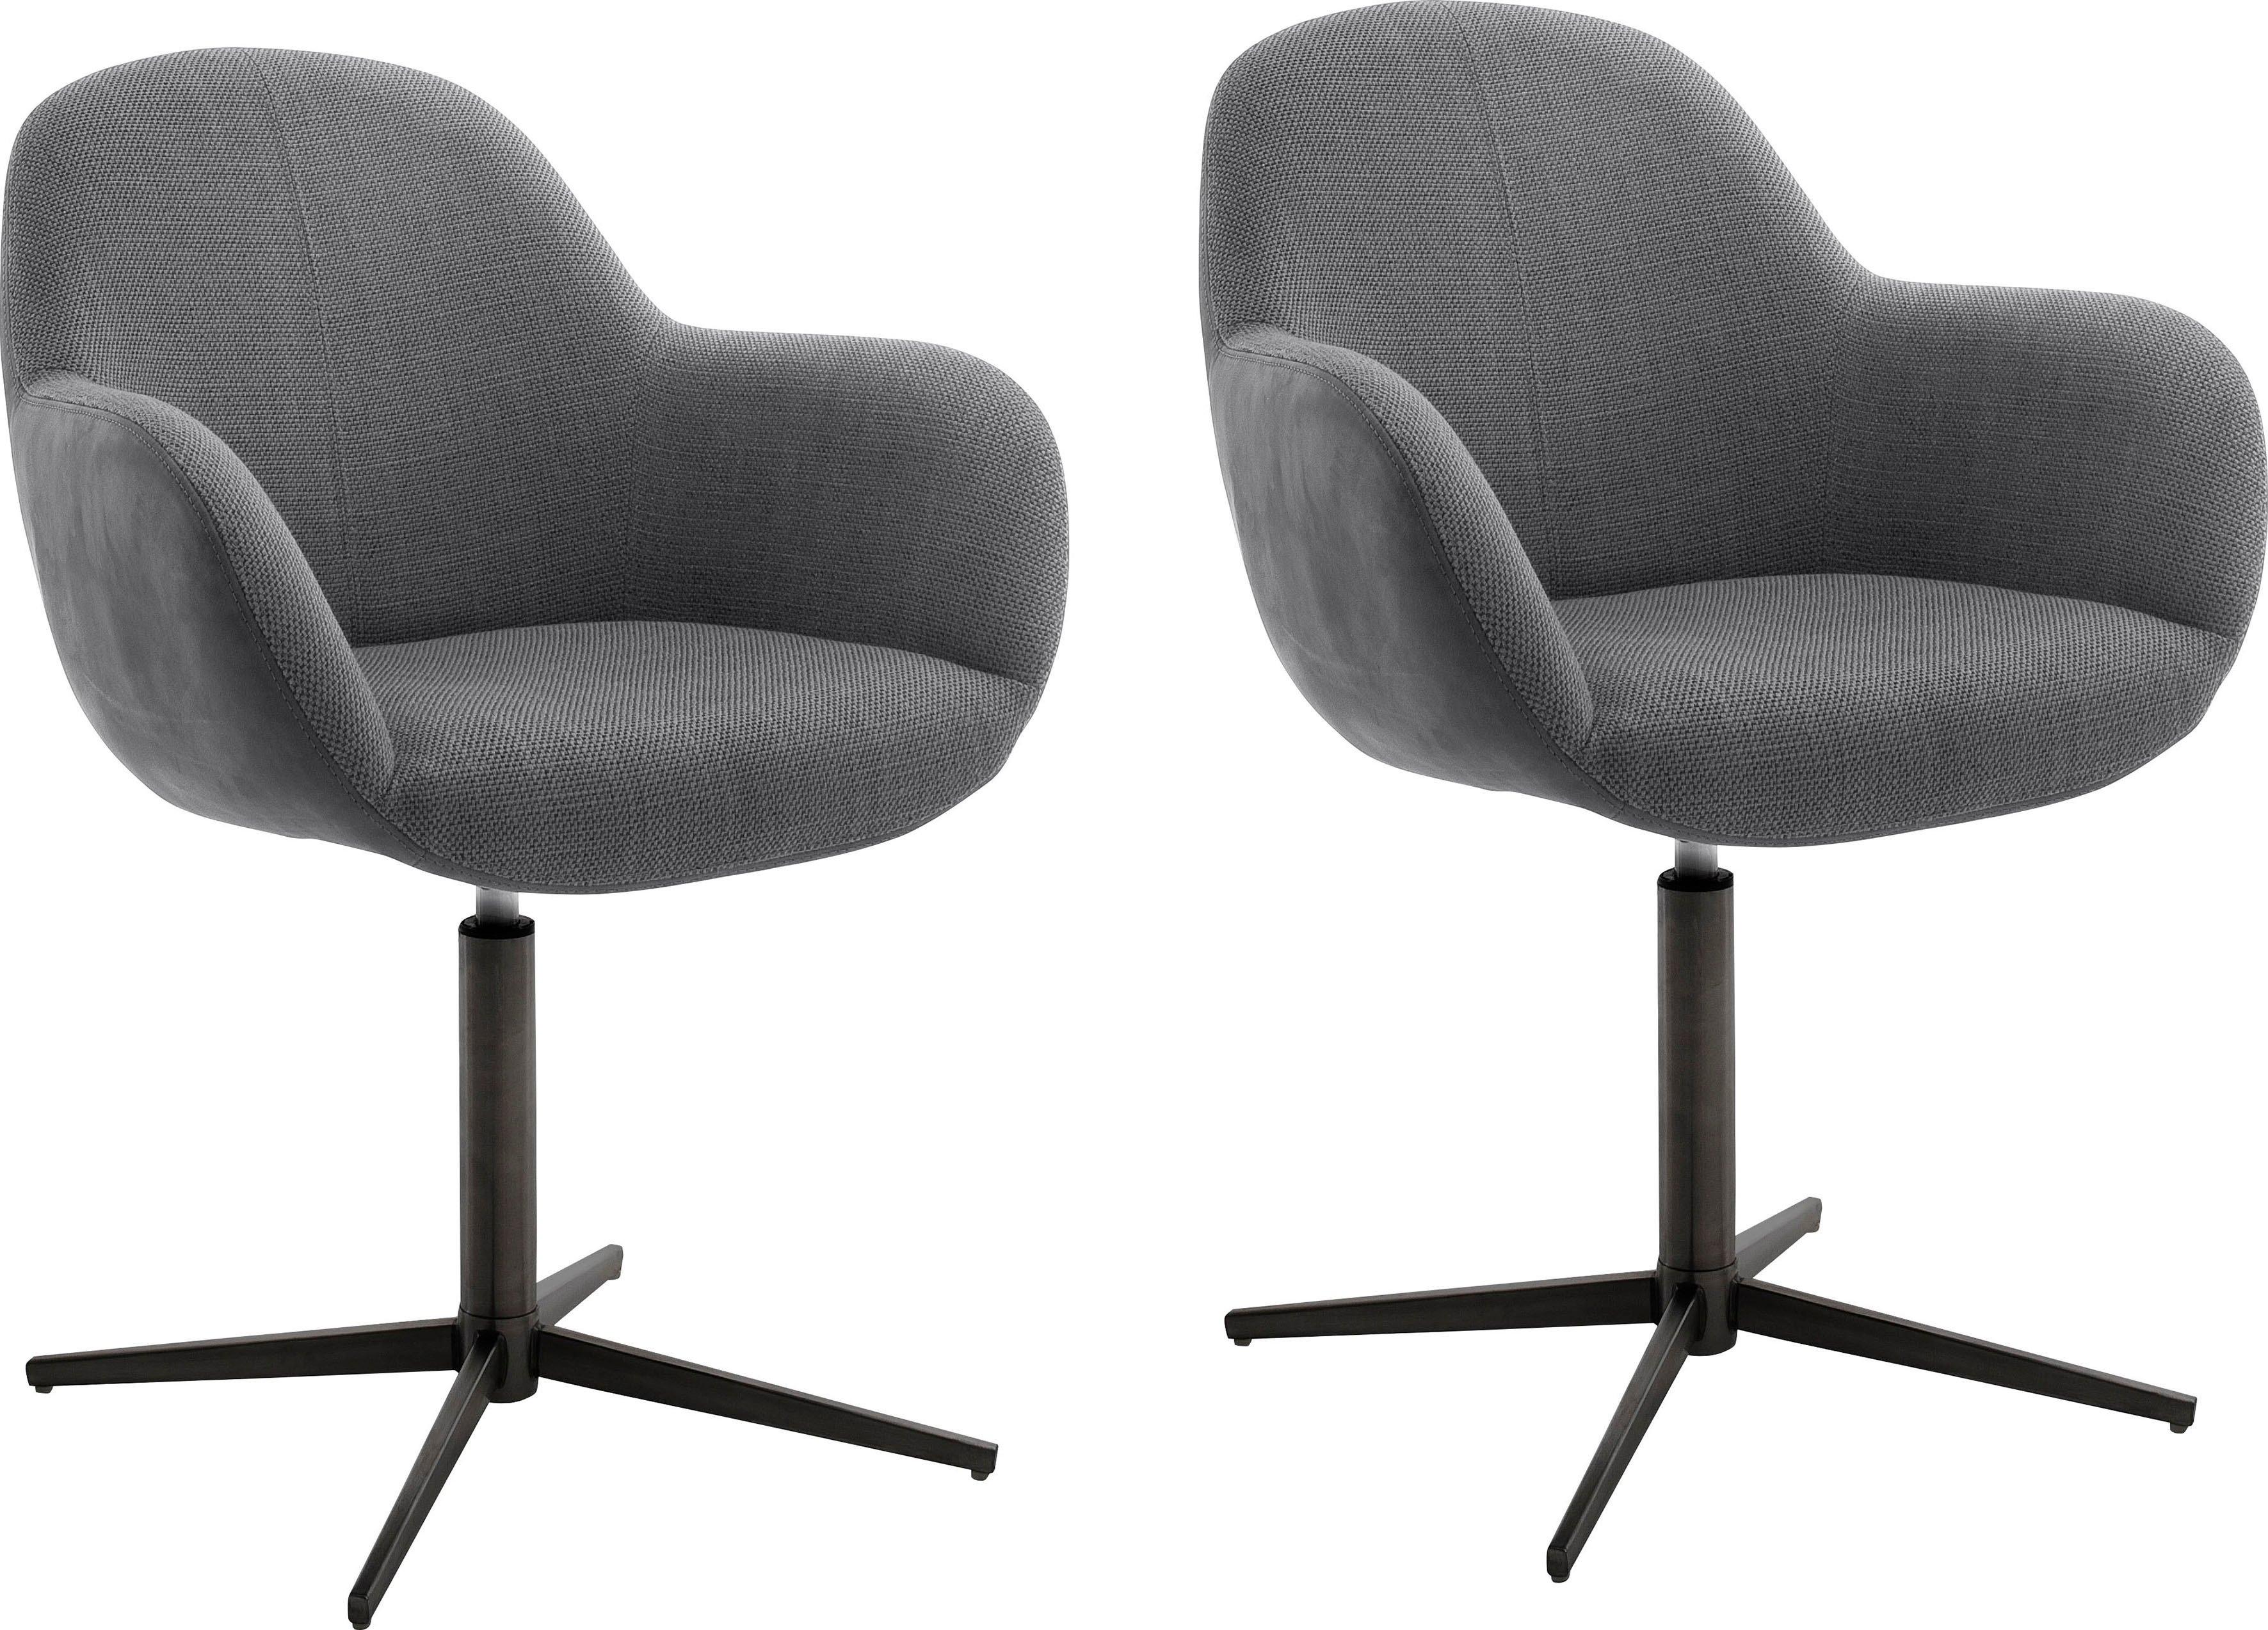 MCA furniture Eetkamerstoel MELROSE Stoel 360º draaibaar met nivellering (set, 2 stuks) online kopen op otto.nl